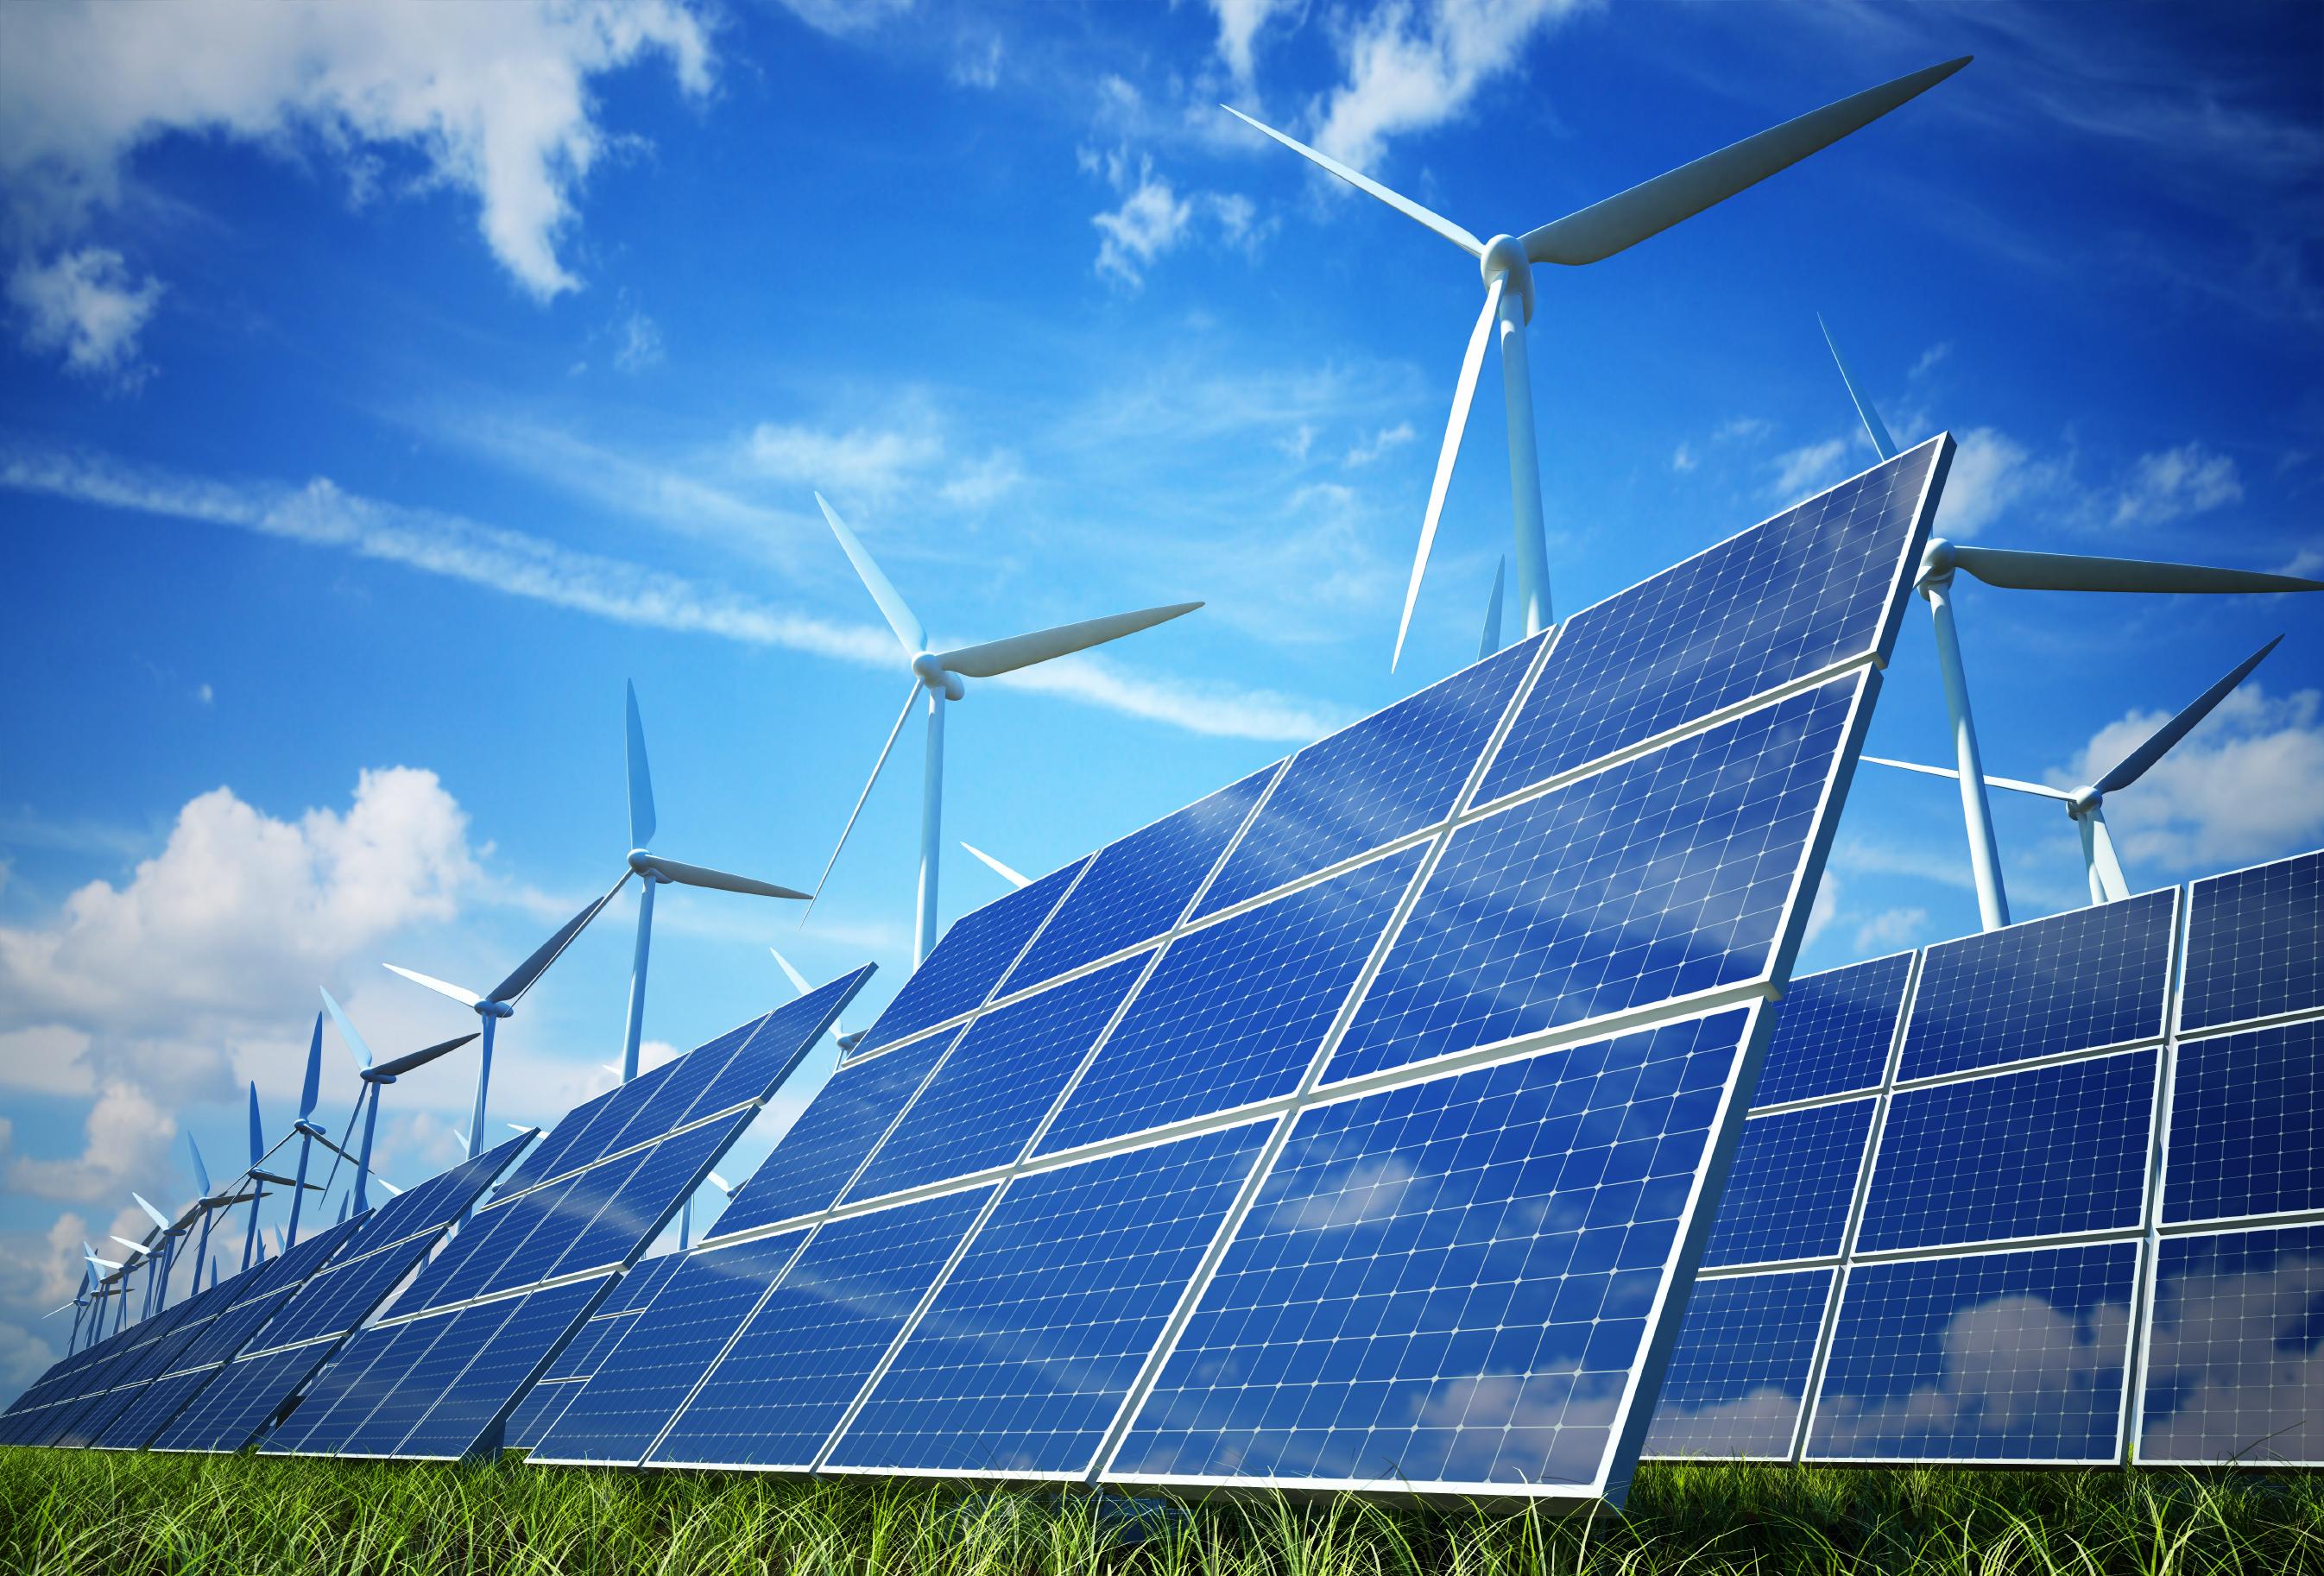 Energy Backgrounds, Compatible - PC, Mobile, Gadgets  2692x1826 px